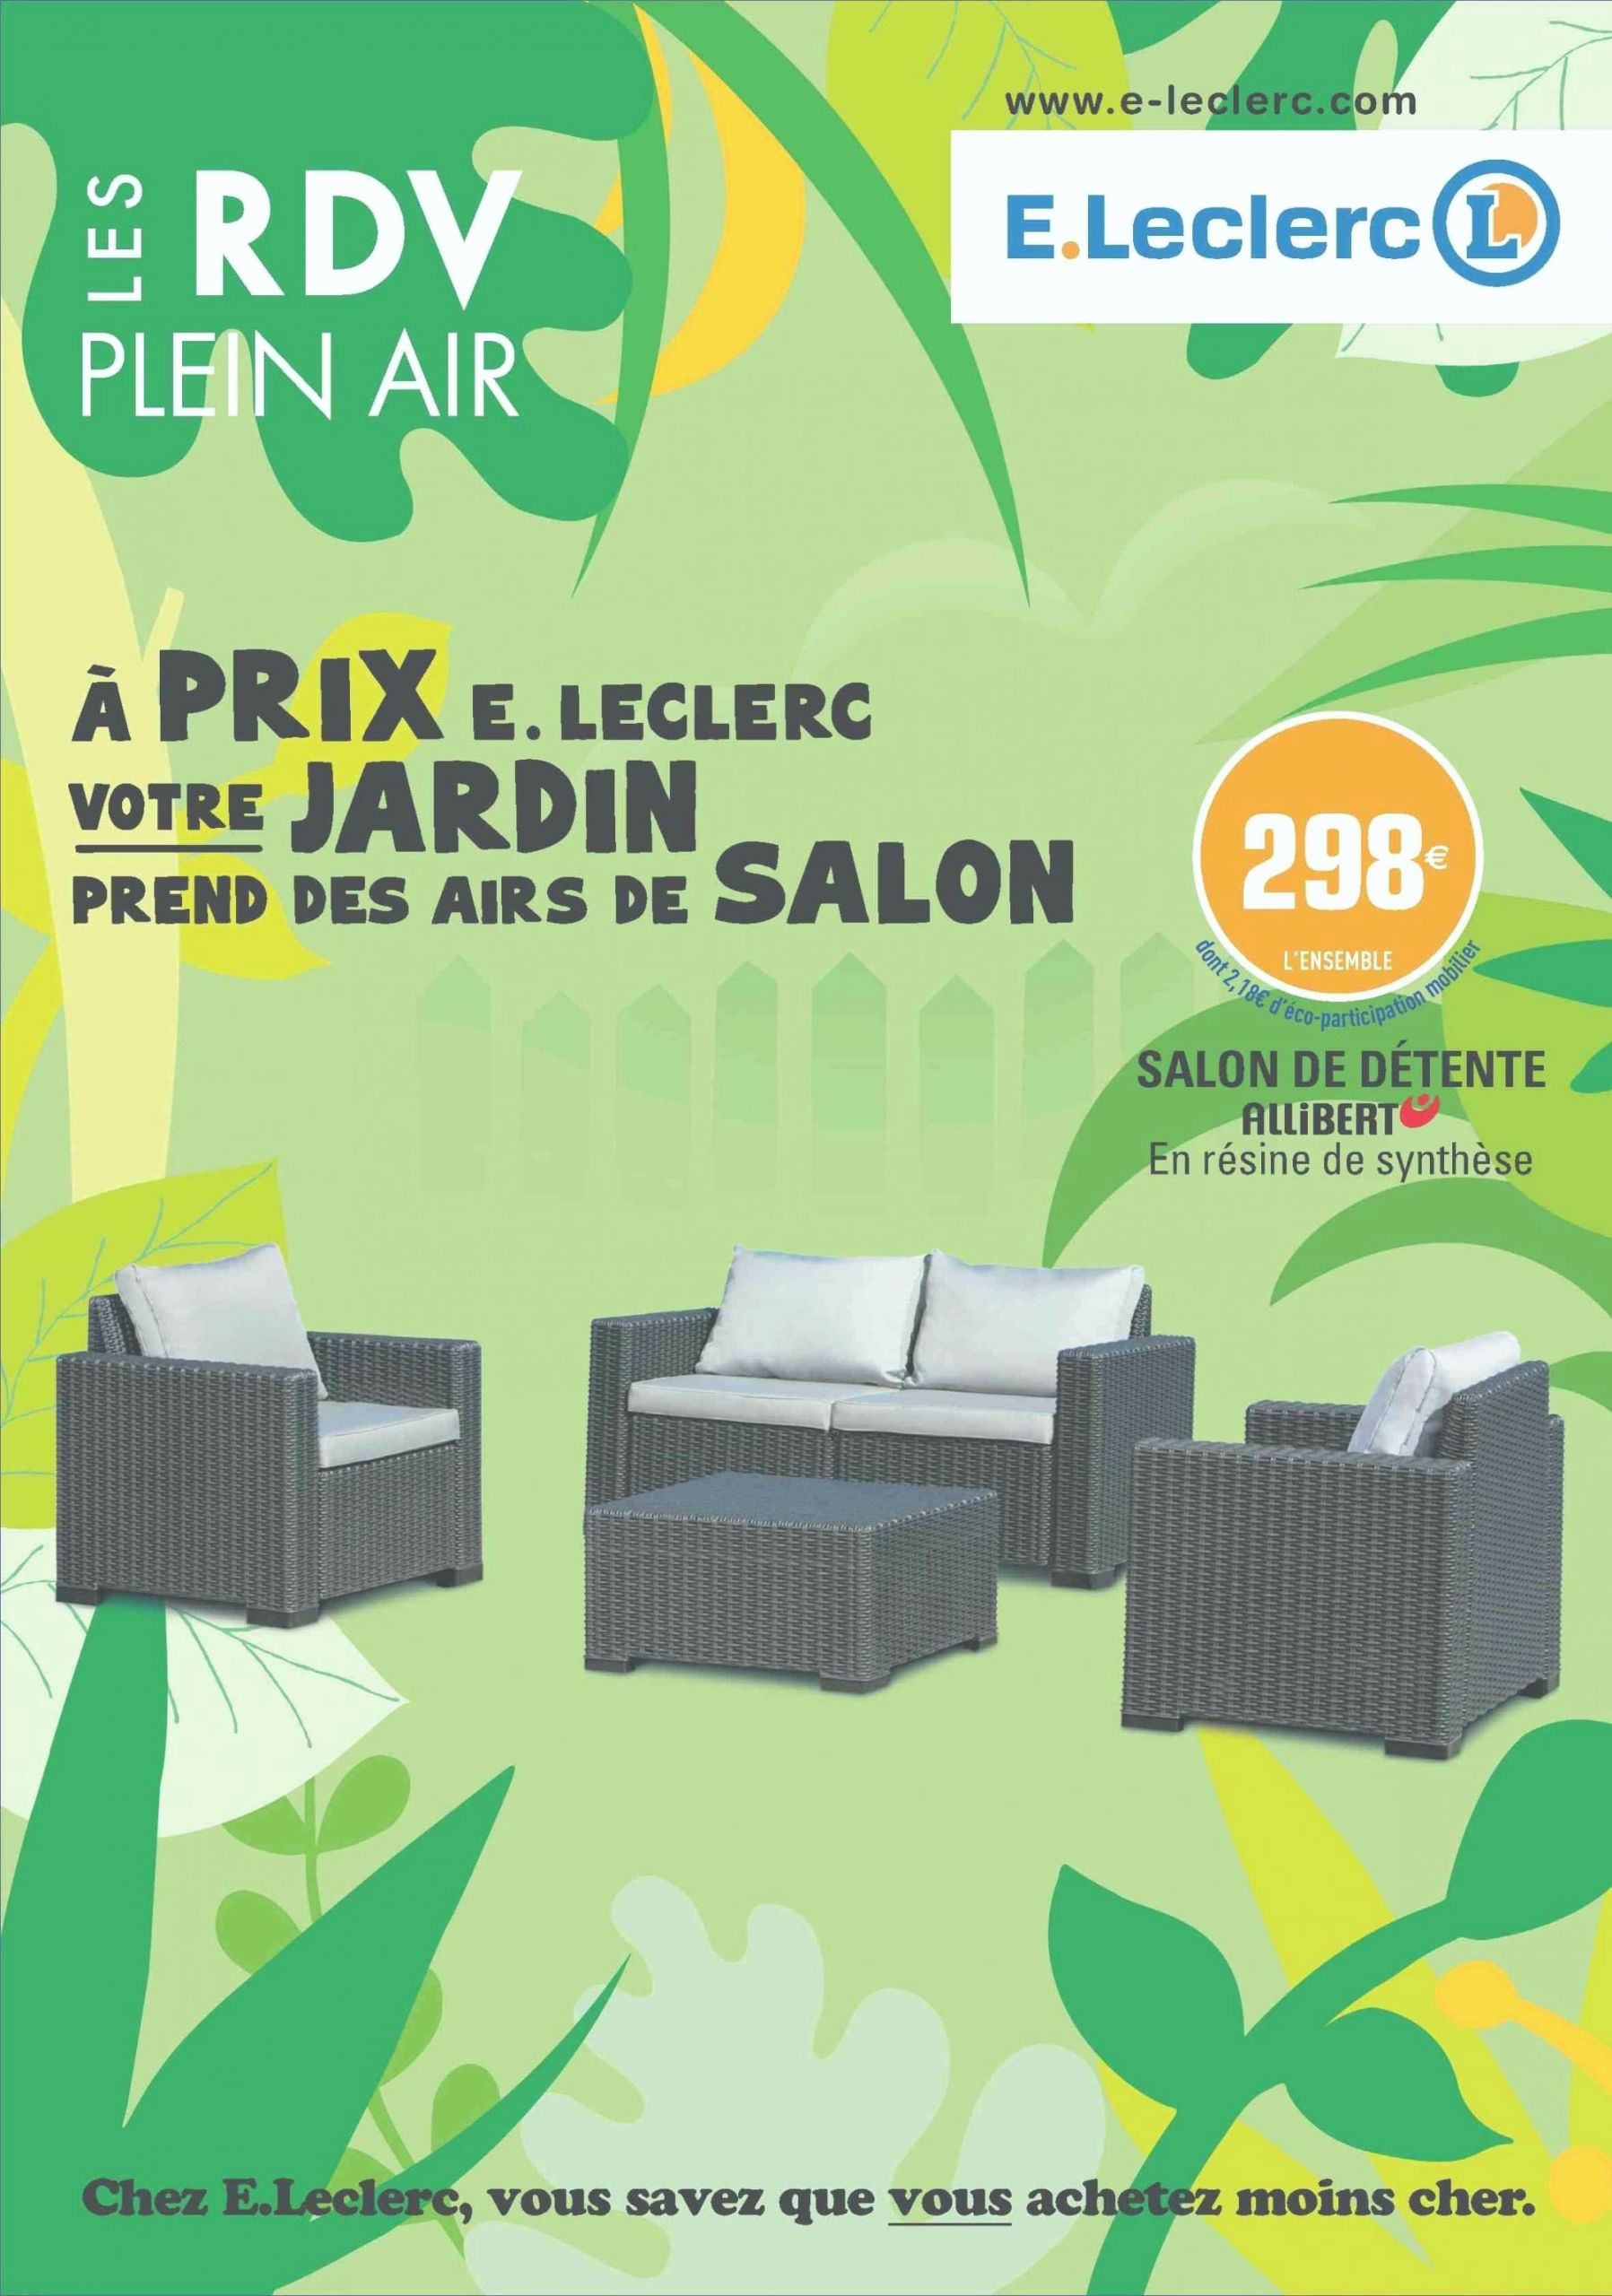 32 Frais Salon De Jardin Bas Leclerc | Salon Jardin dedans Salon De Jardin En Résine Tressée Leclerc